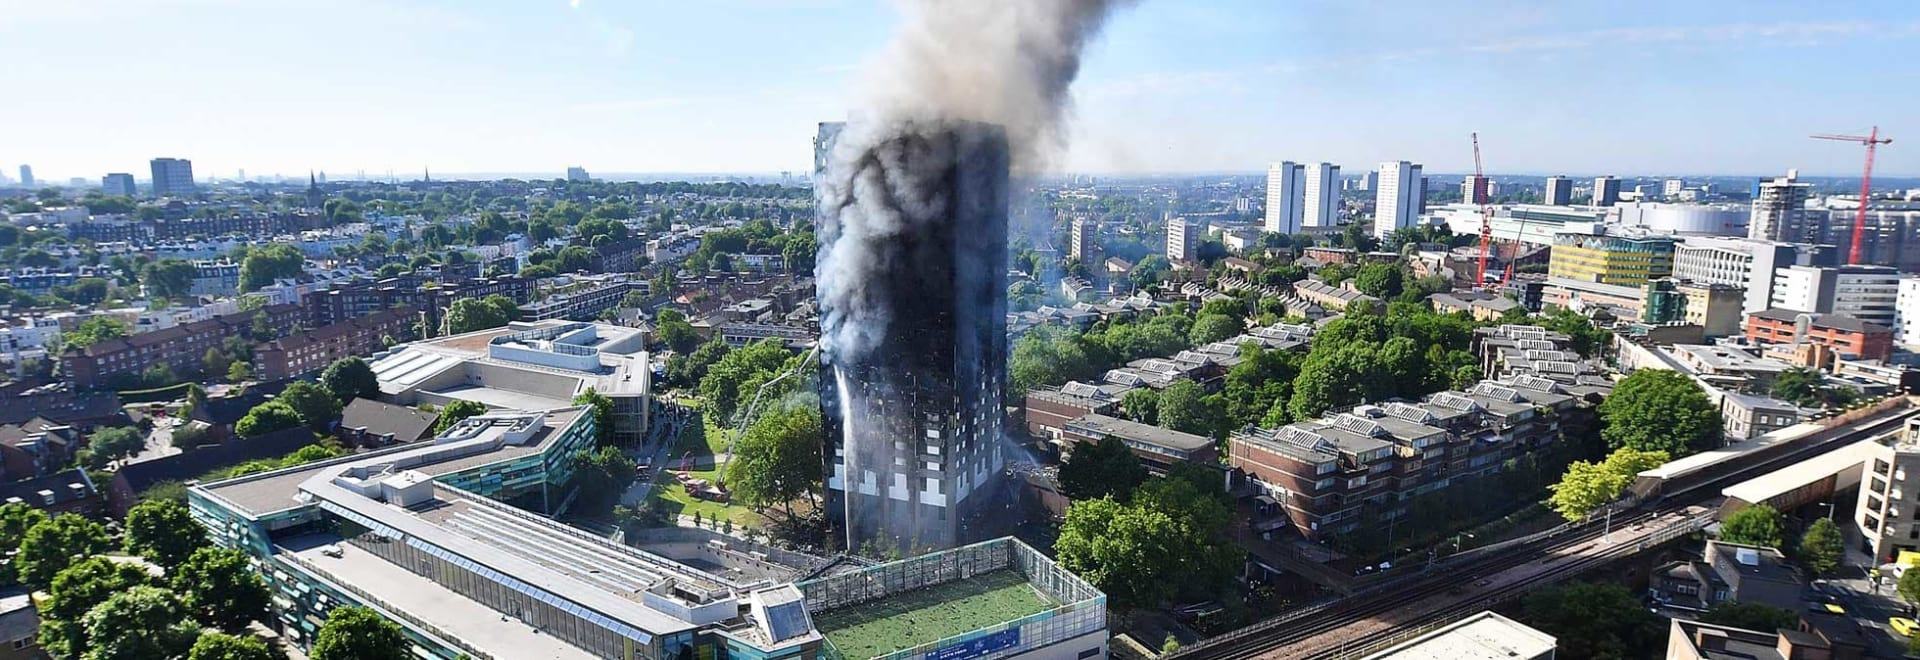 Grenfell Tower fire in London.